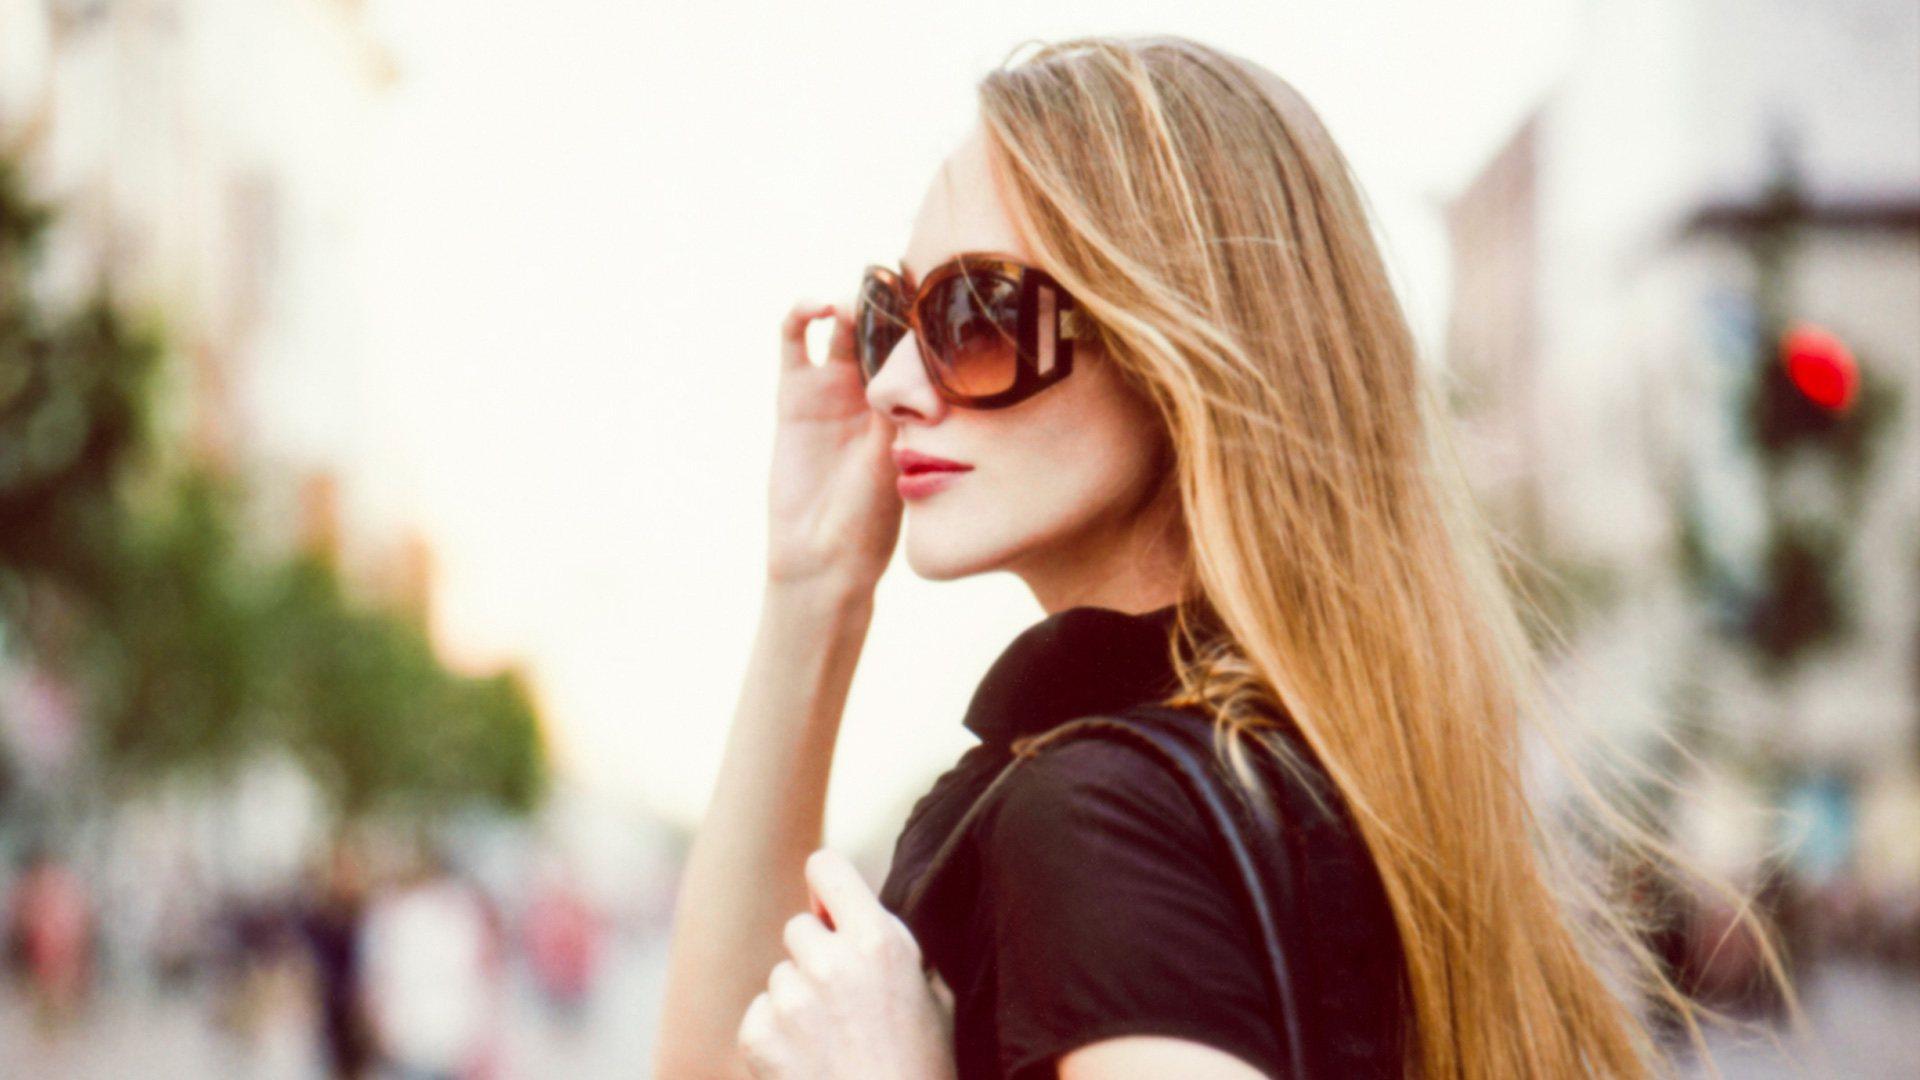 How to Buy Good Sunglasses